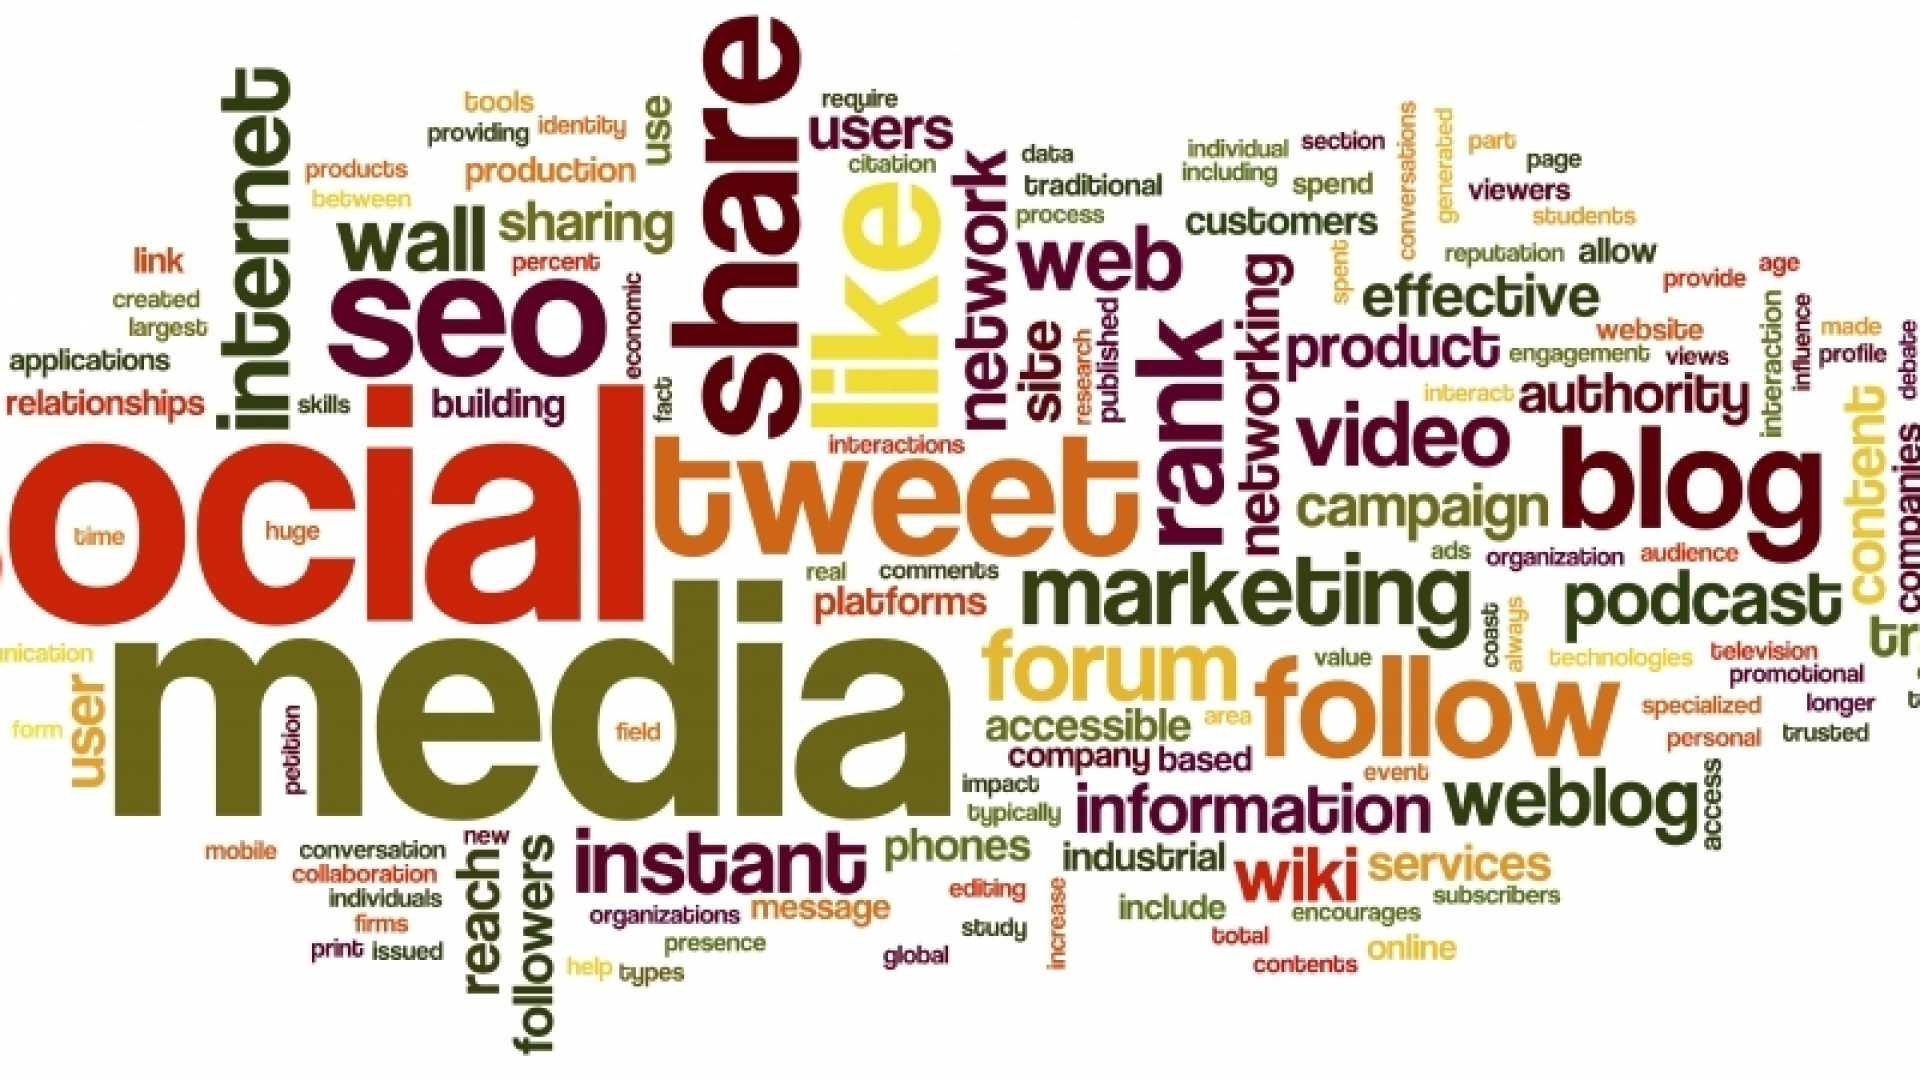 Five Ways Social Media Increases Company Values